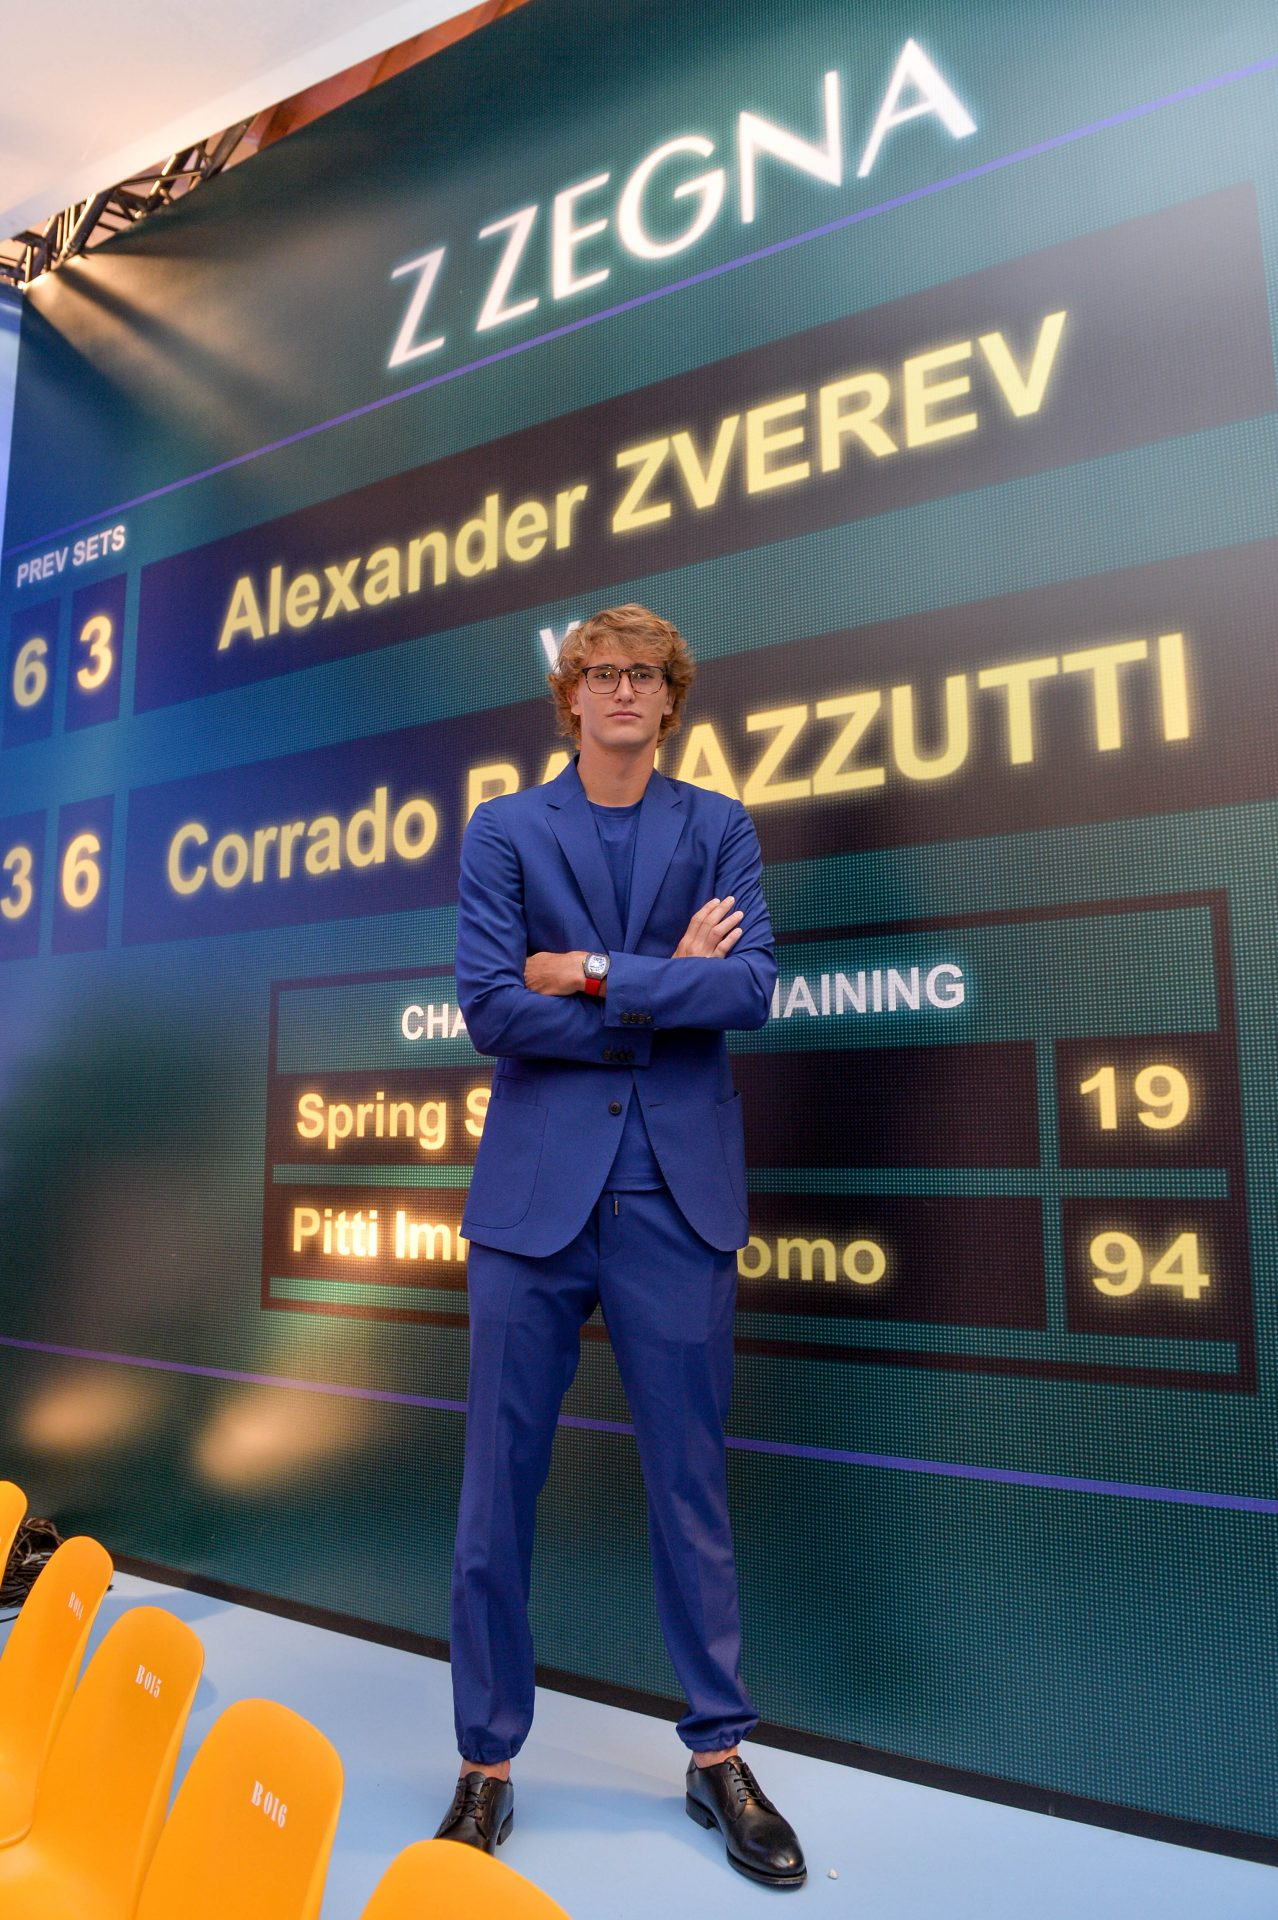 Alexander Zverev Brand endorsement advertising ambassador contract deal Z Zegna.jpg